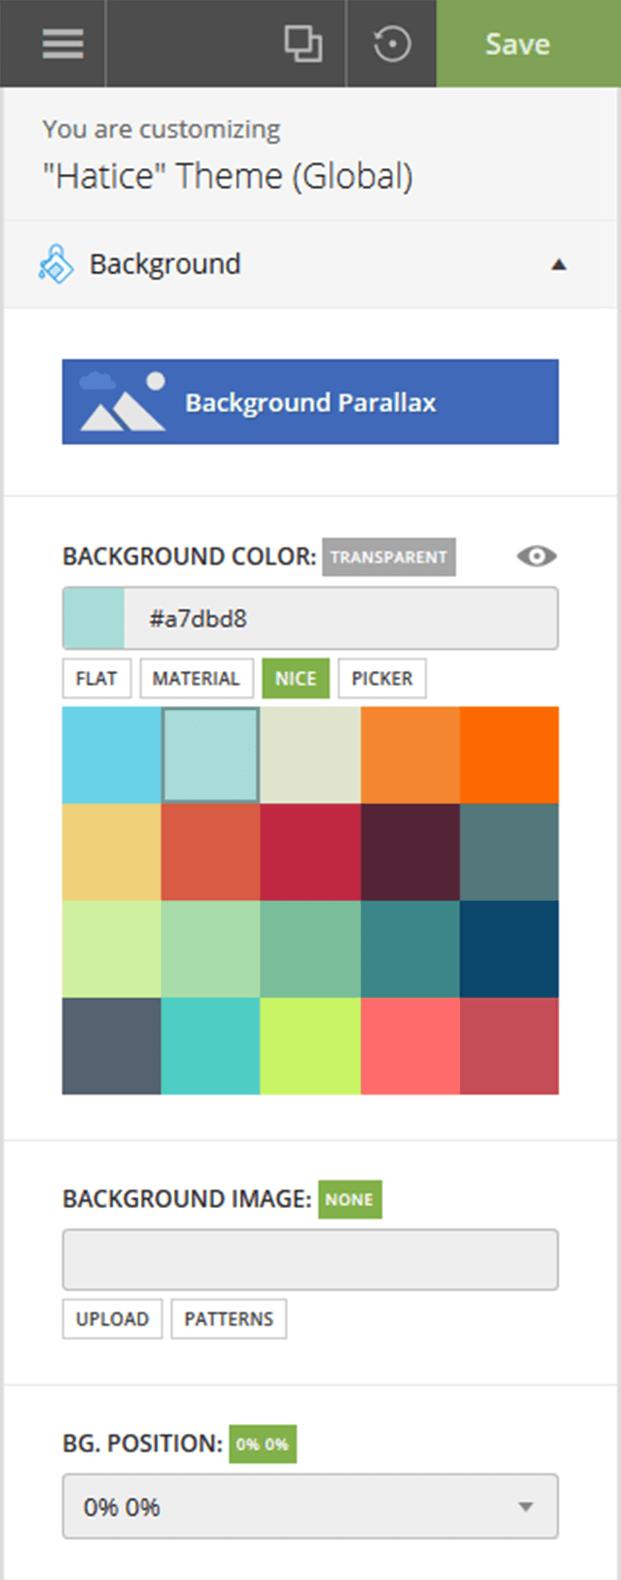 Background color change